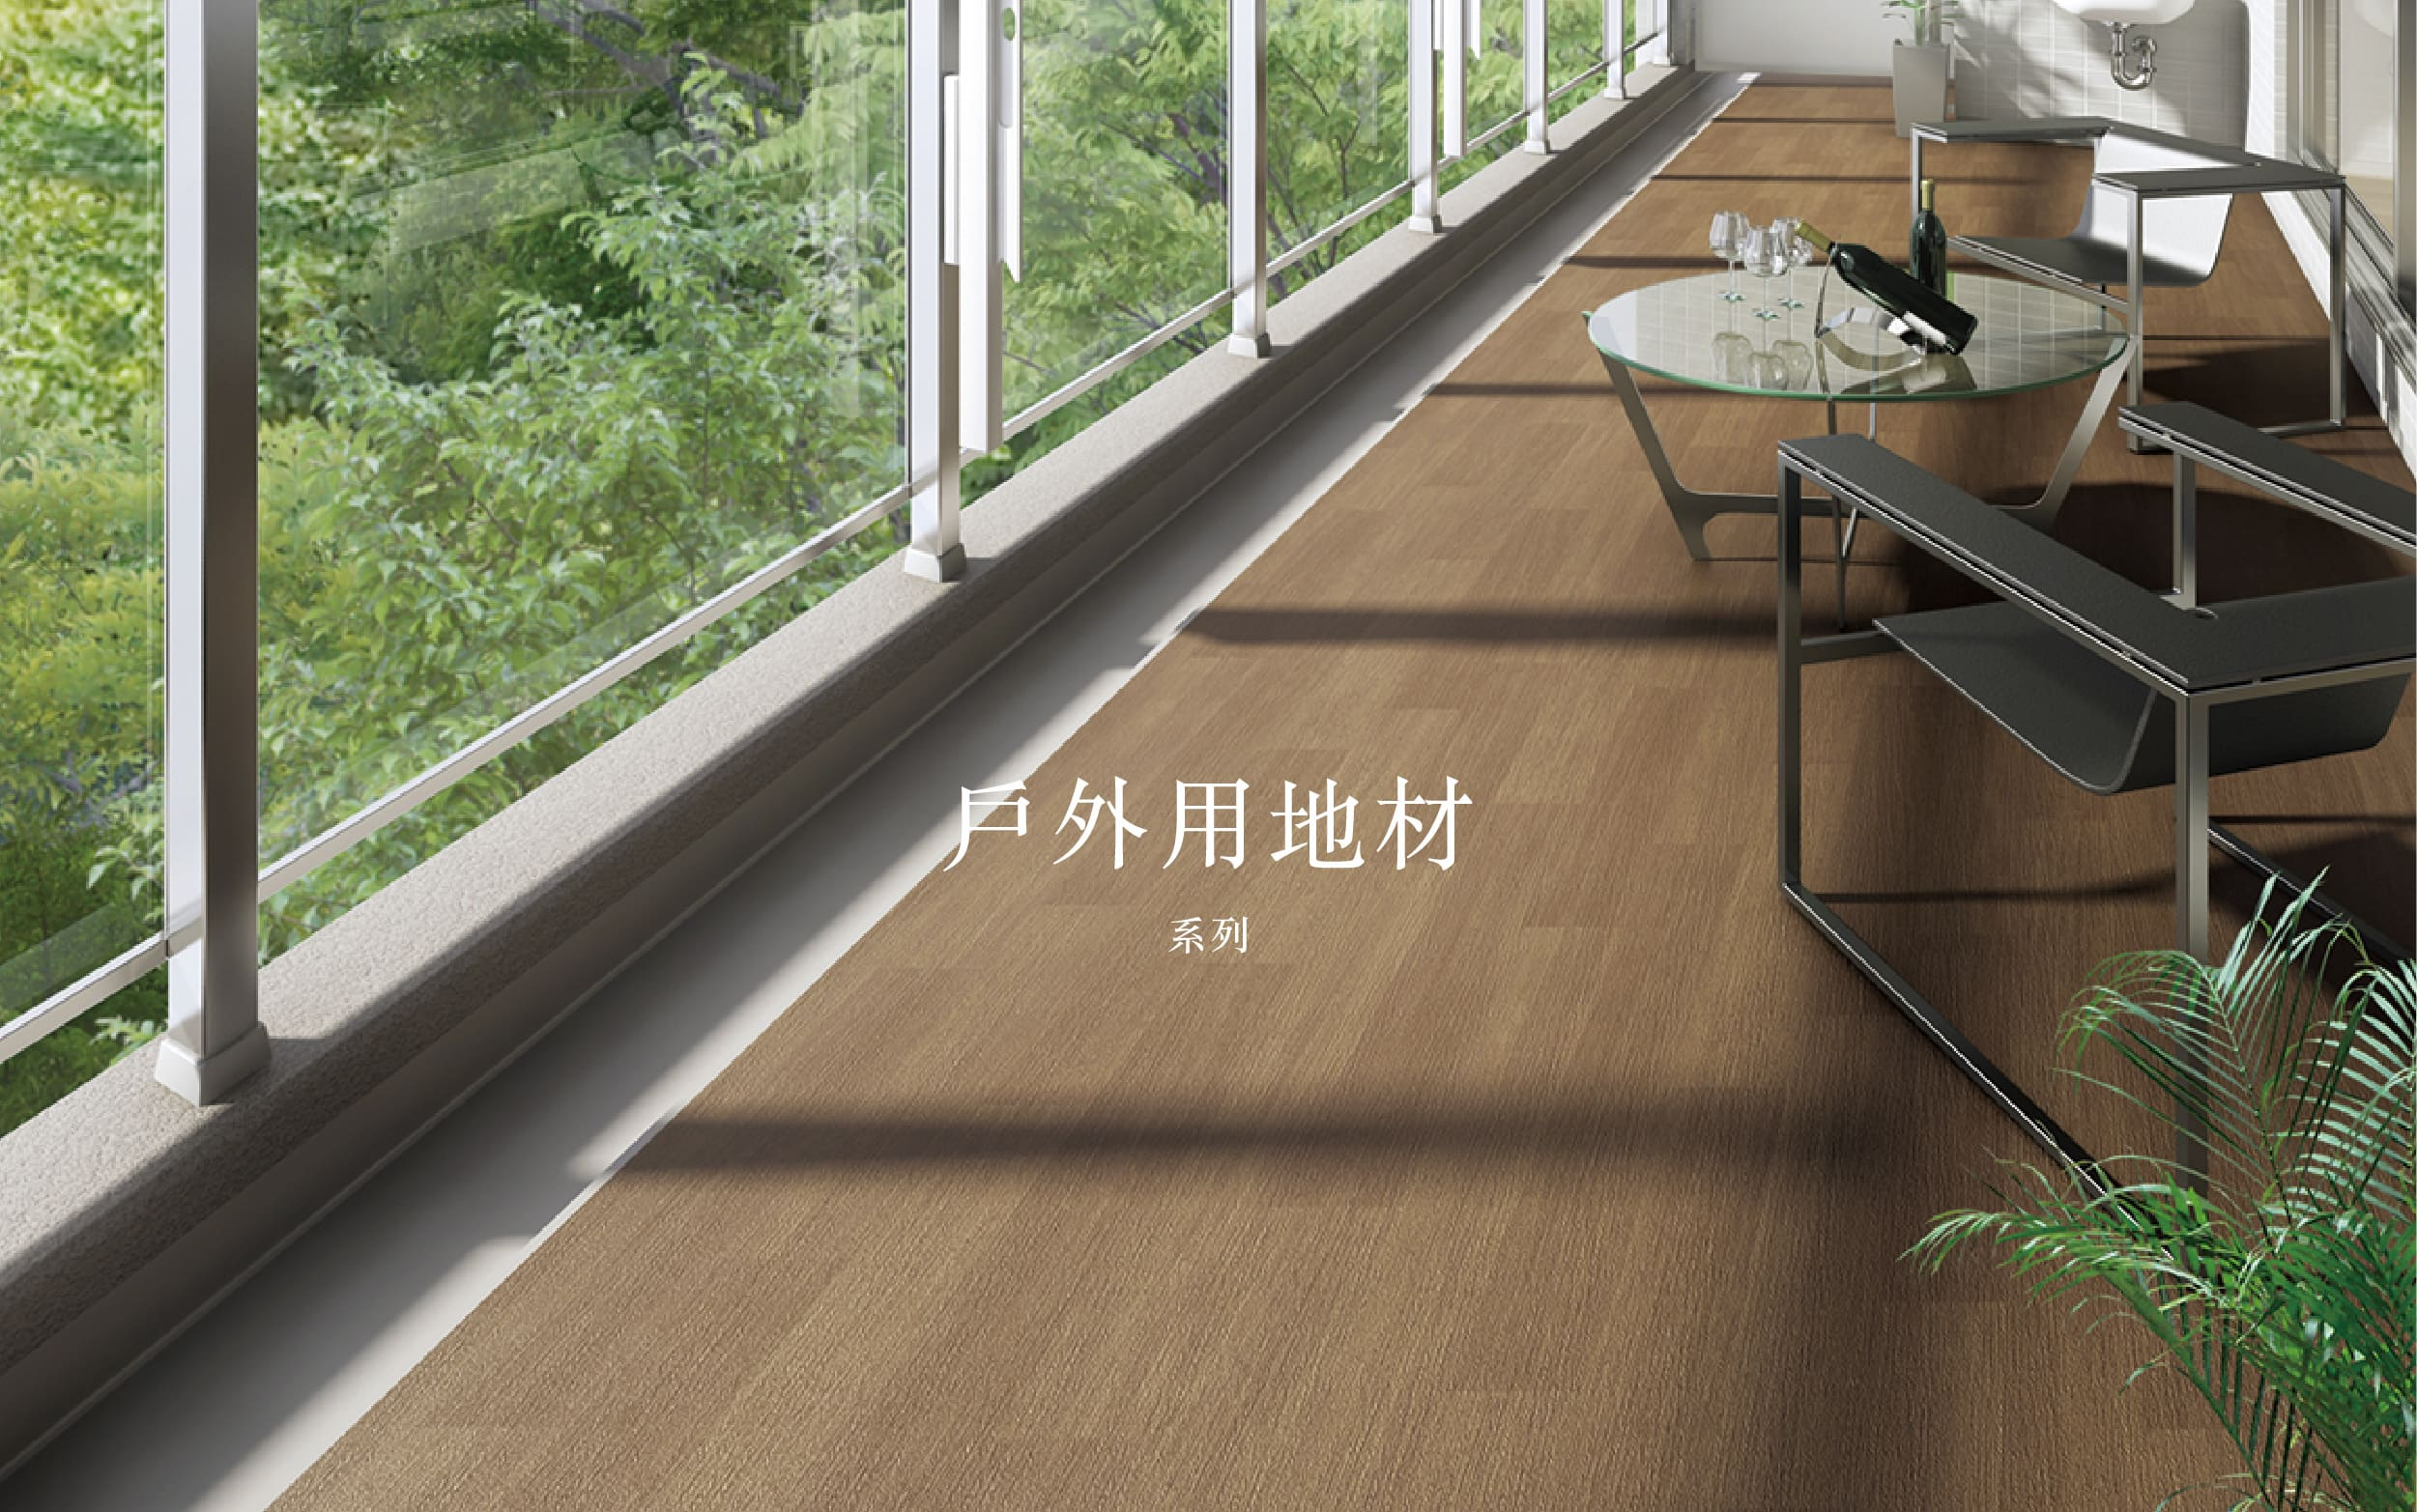 Tat Ming Flooring parquet flooring